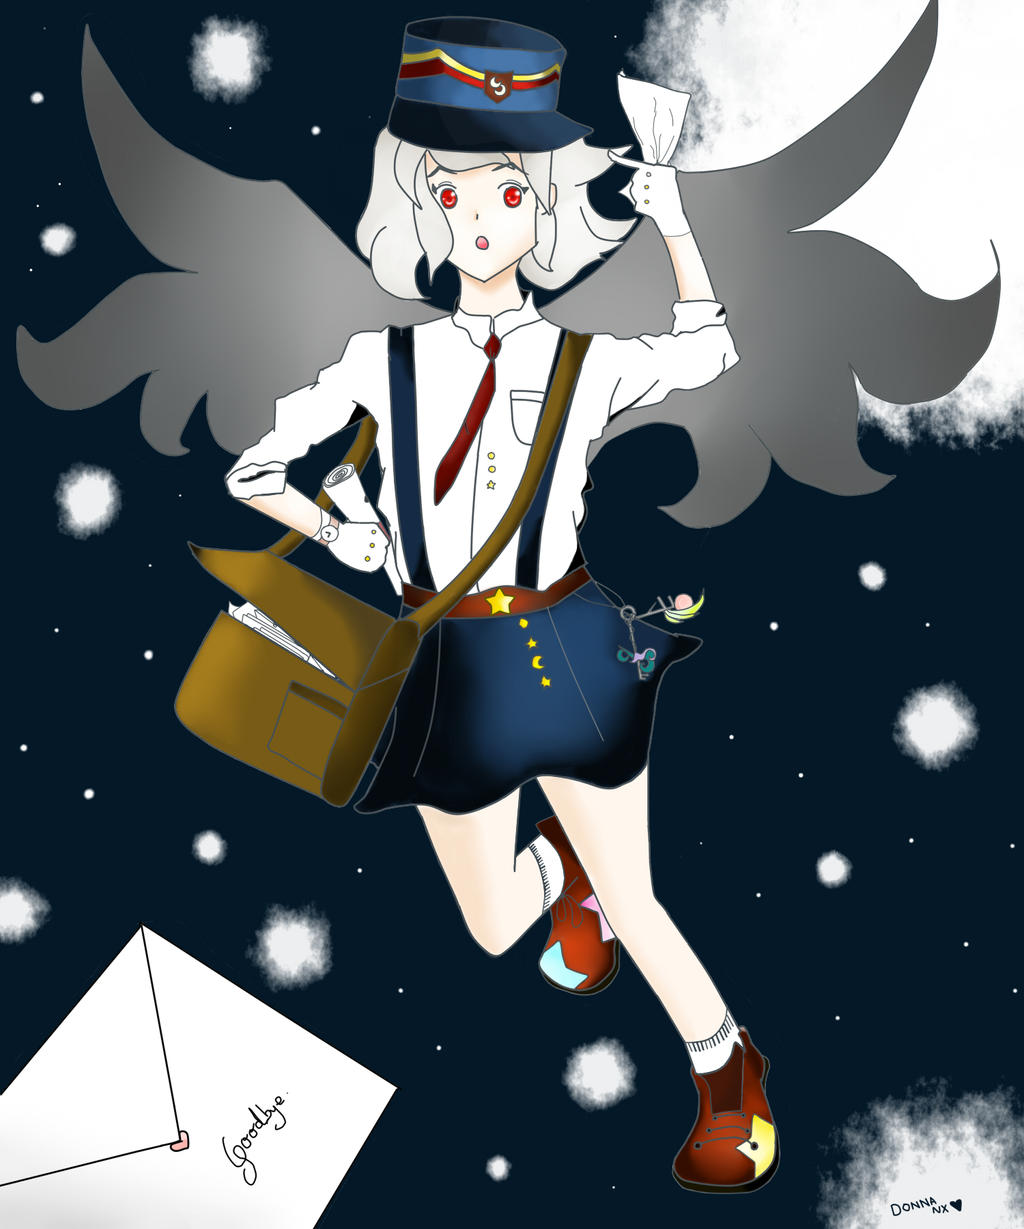 Postwoman by donnita-sama